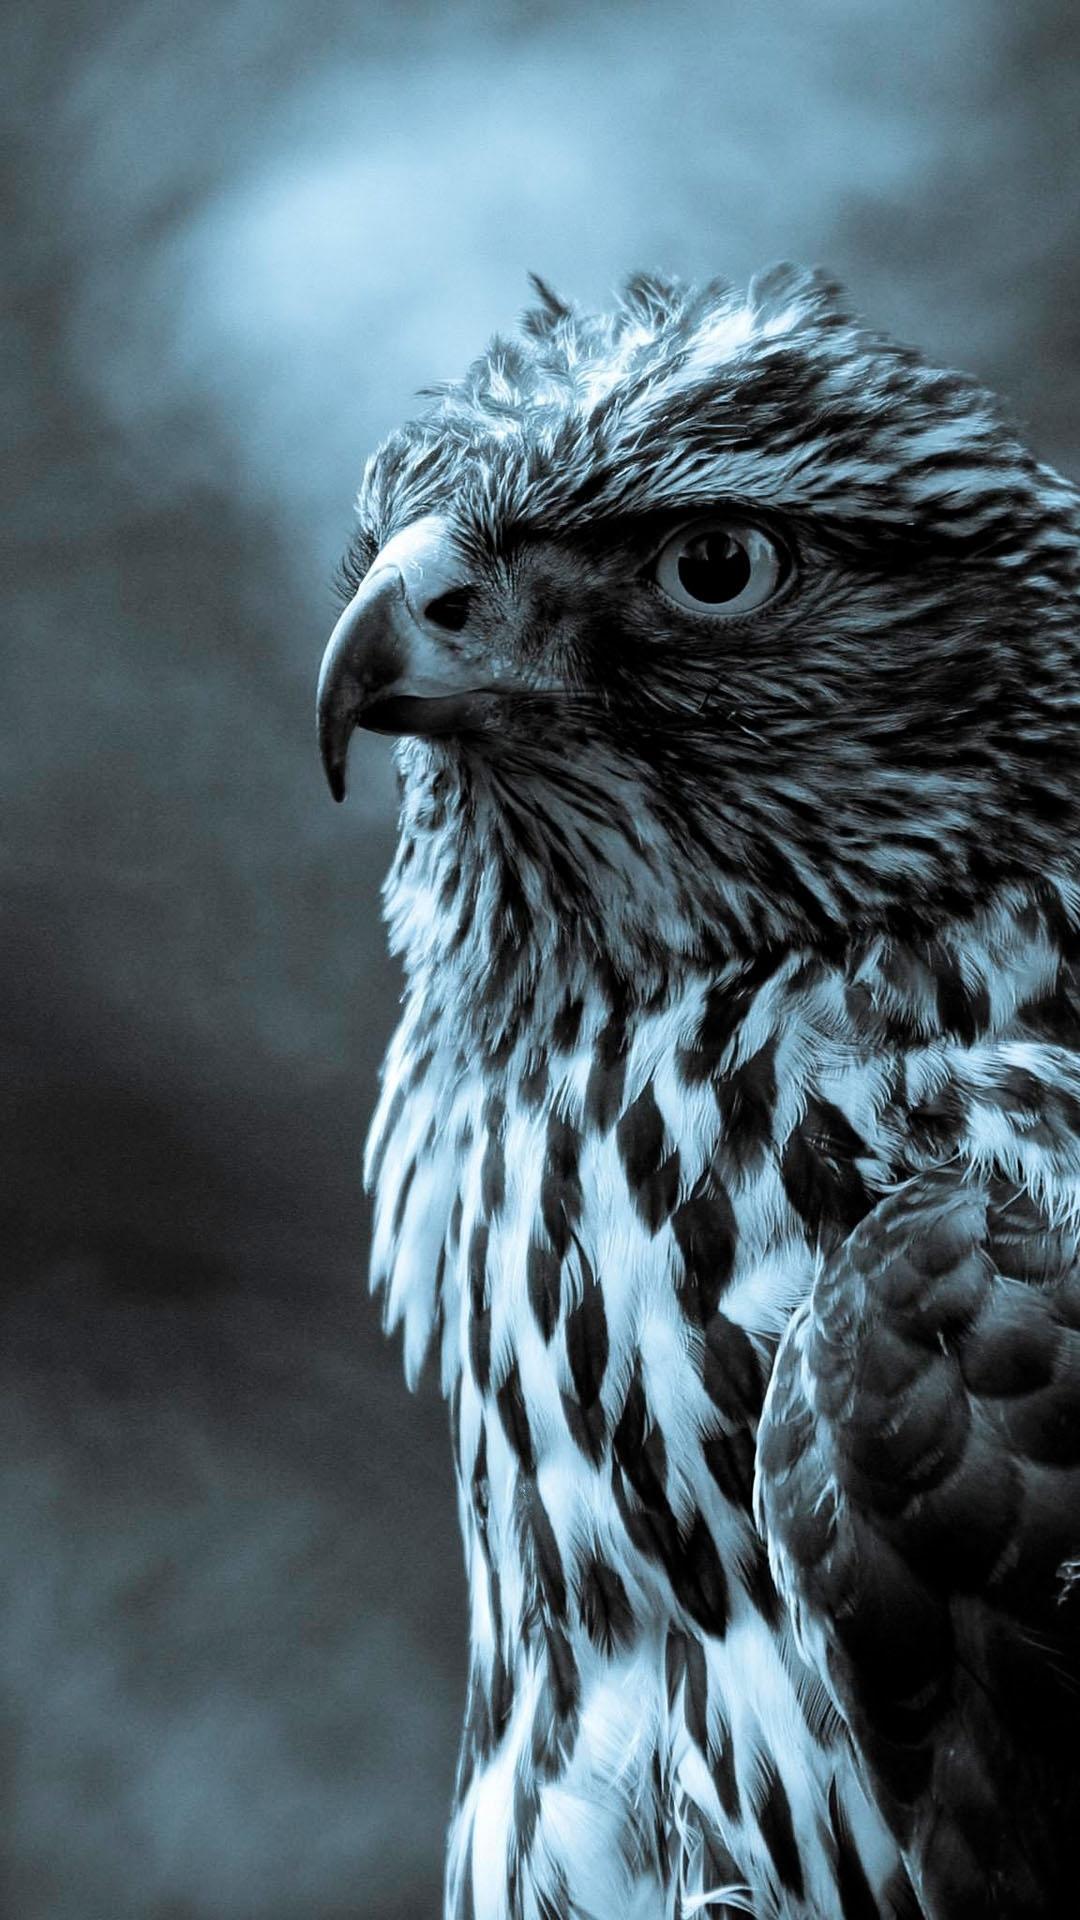 twilight eagle profile dark android wallpaper free download